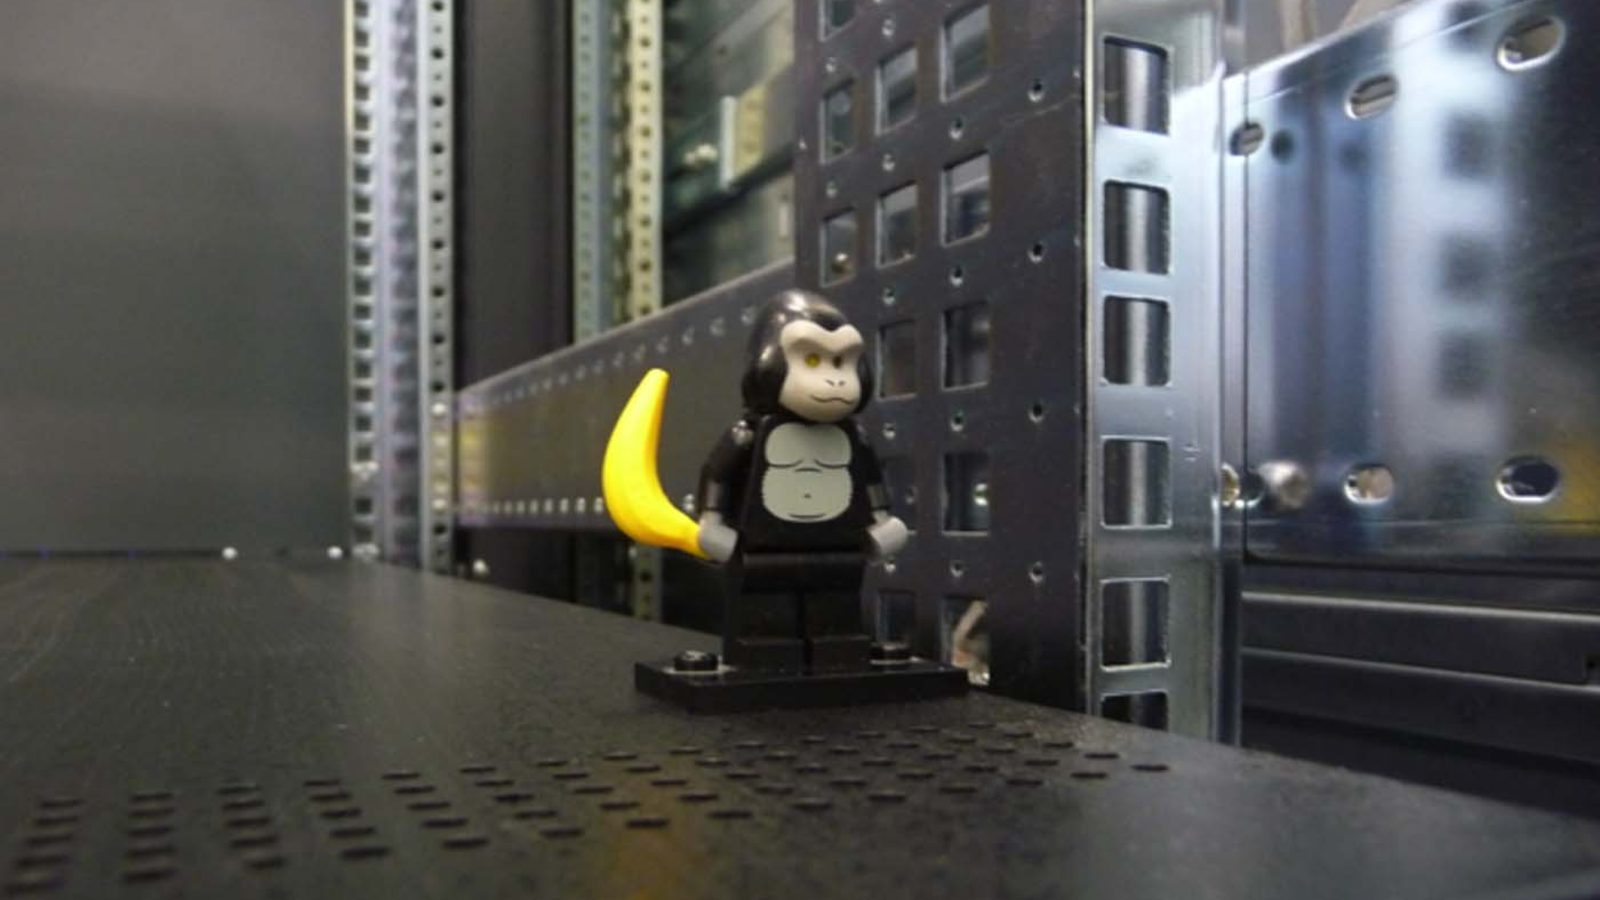 Photo: LEGO gorilla